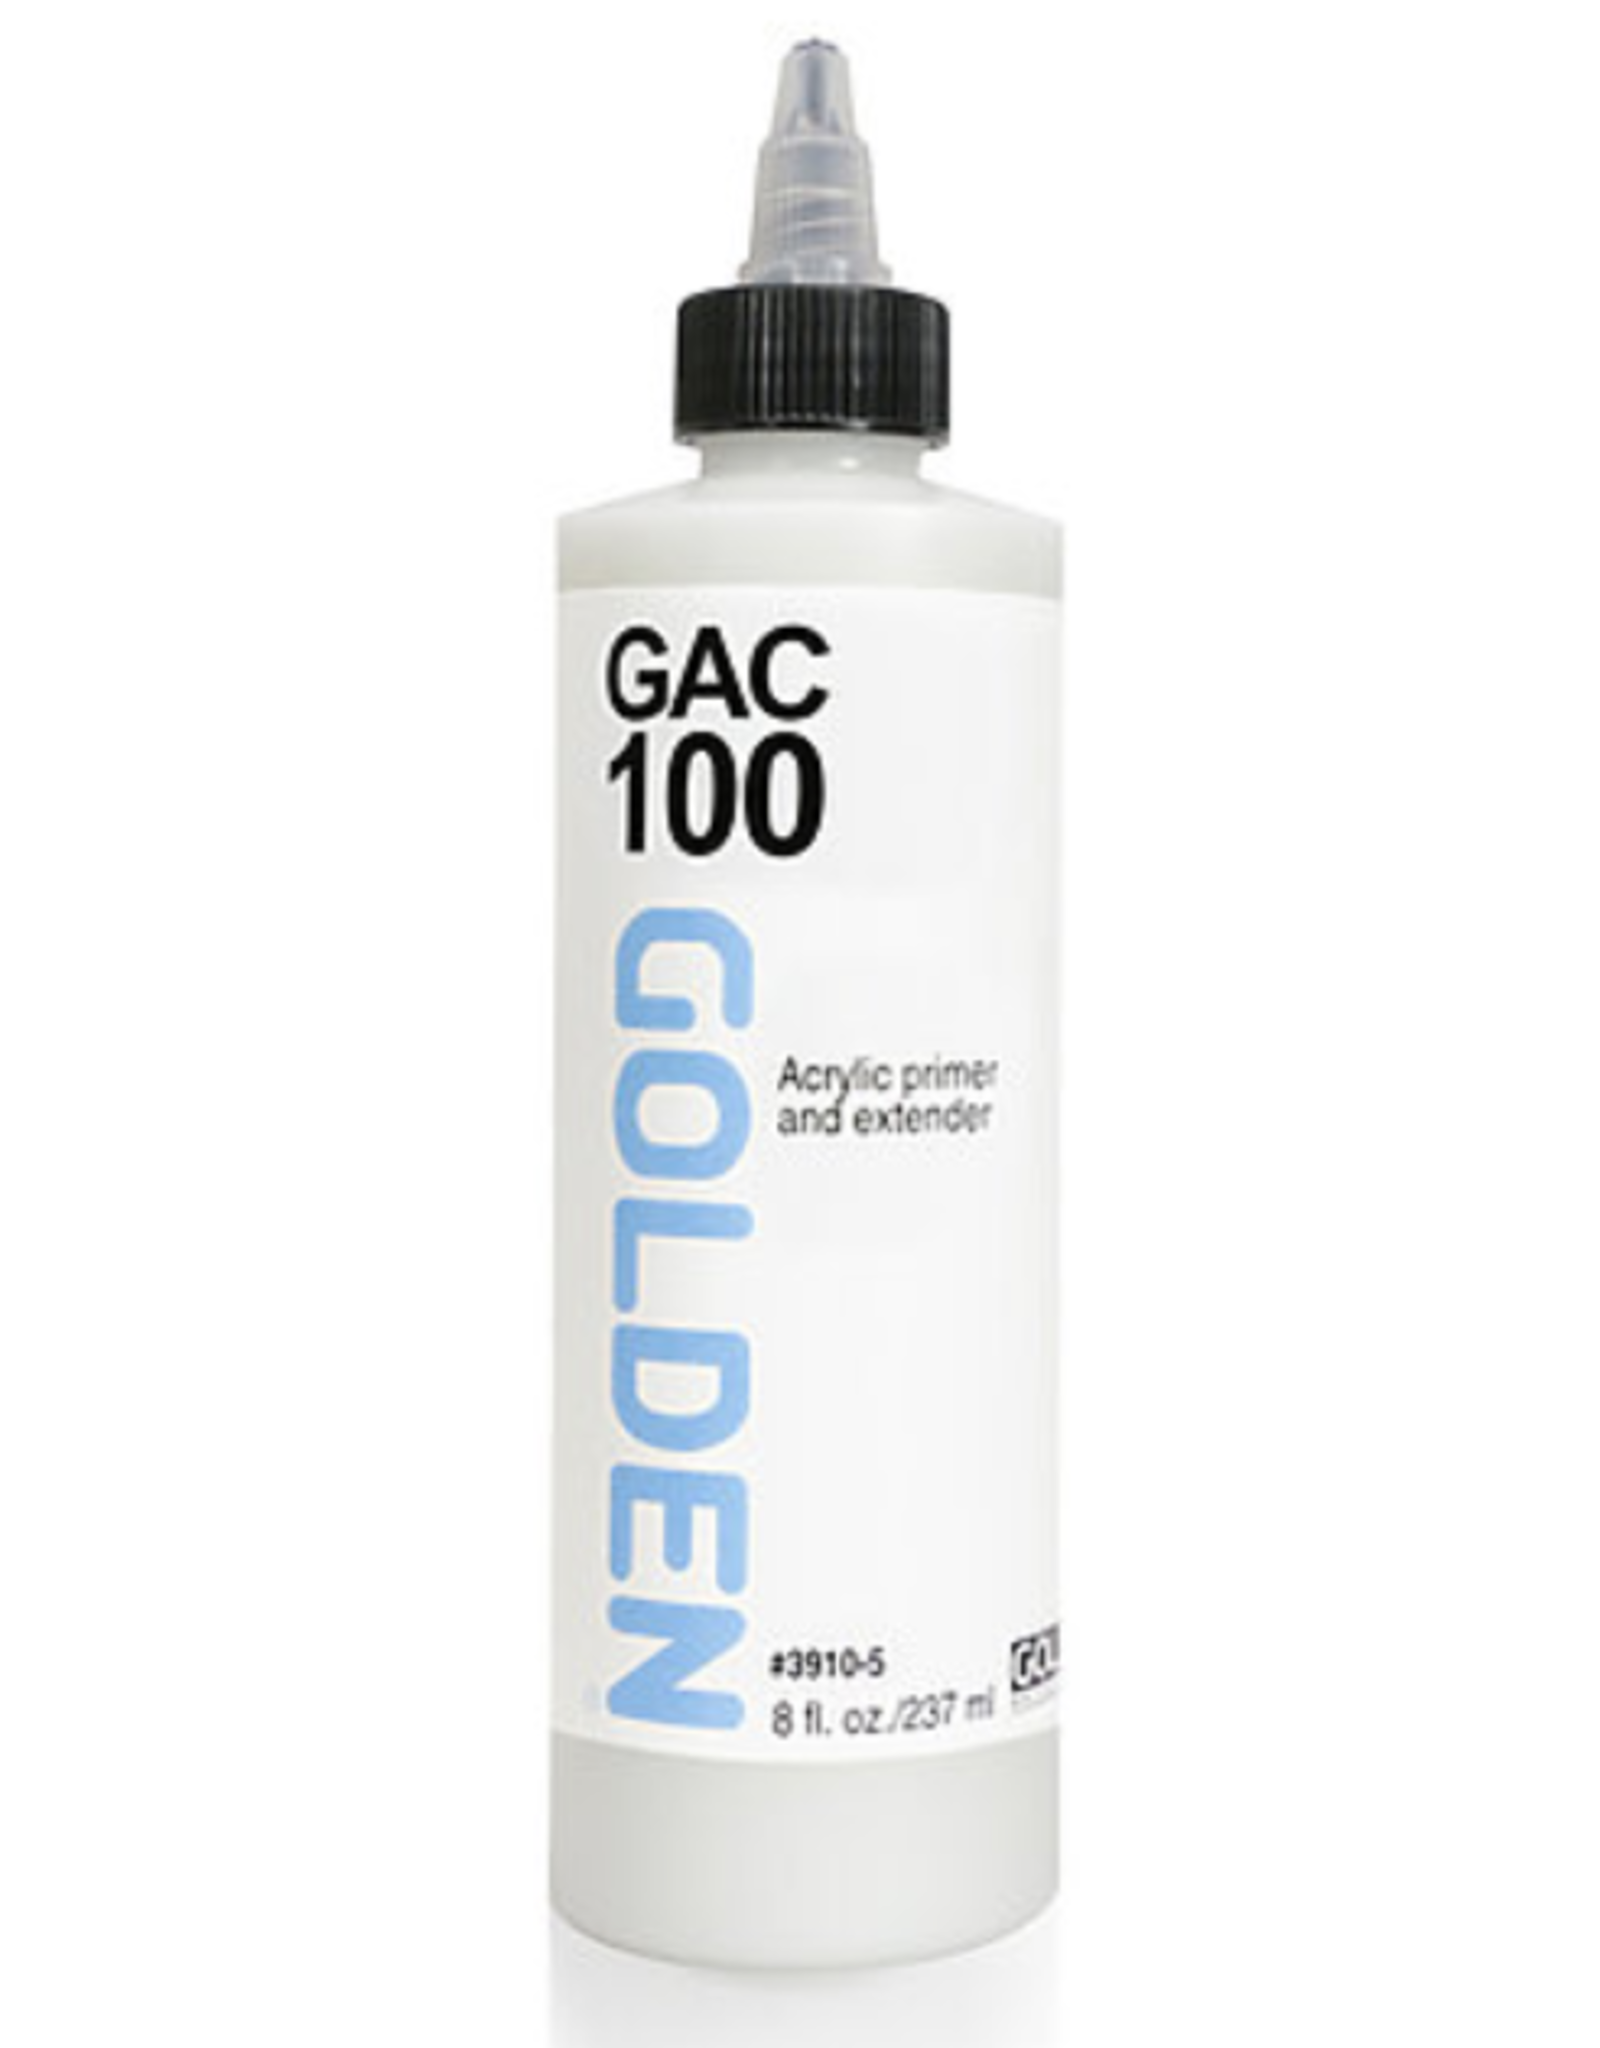 GAC 100, Golden Universal Acrylic Polymer, 8oz